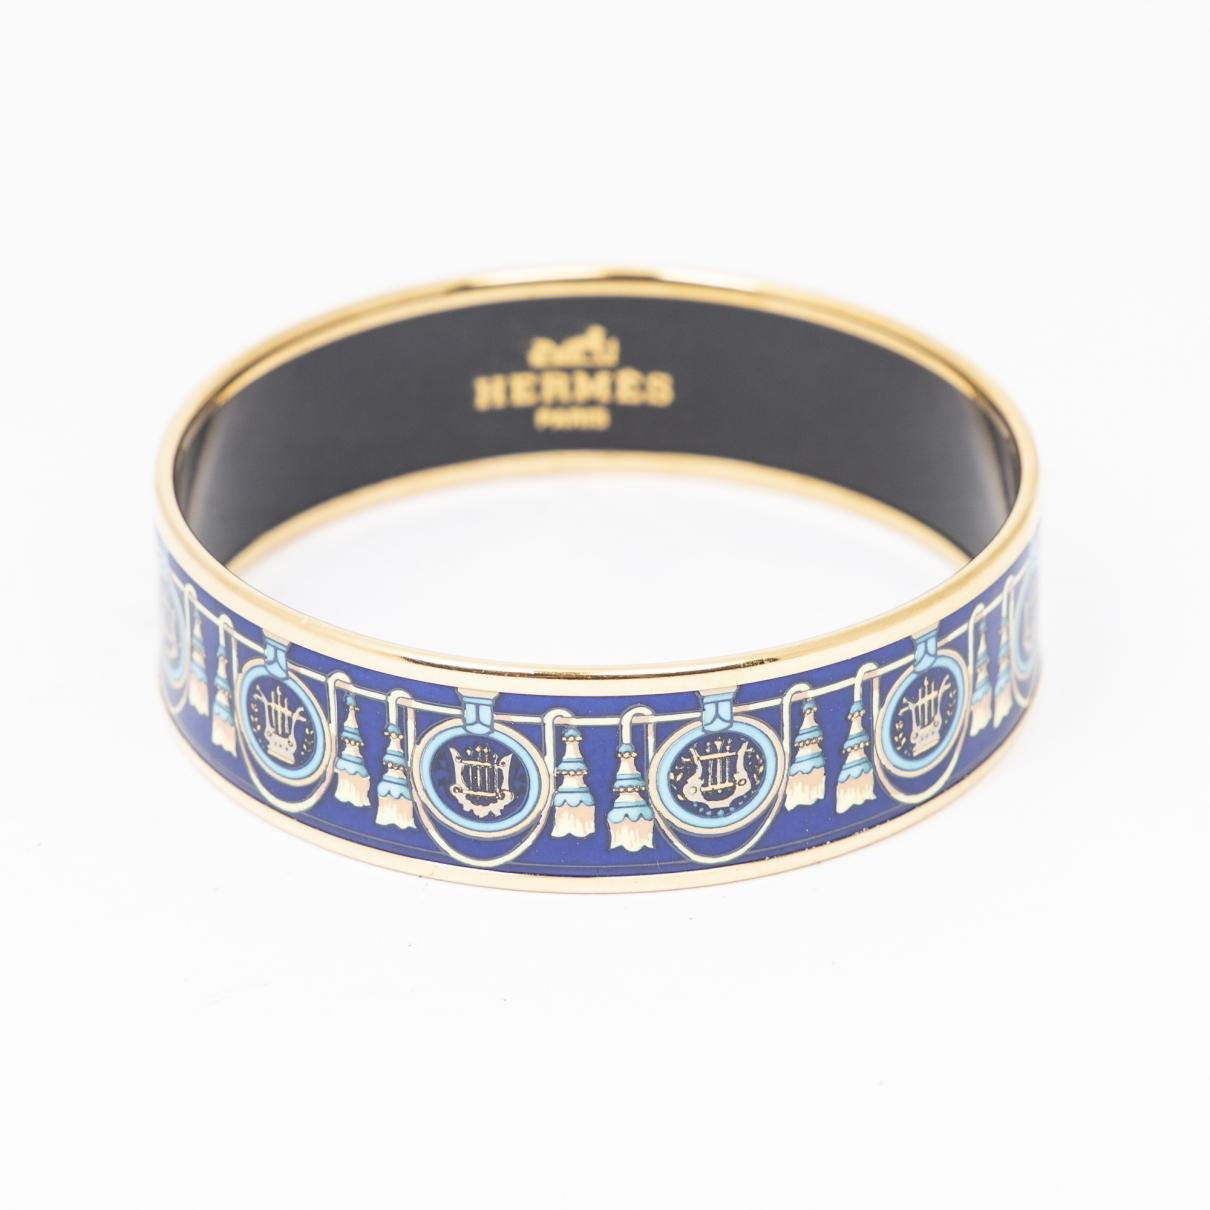 Hermes - Bracelet   pour femme en metal - bleu